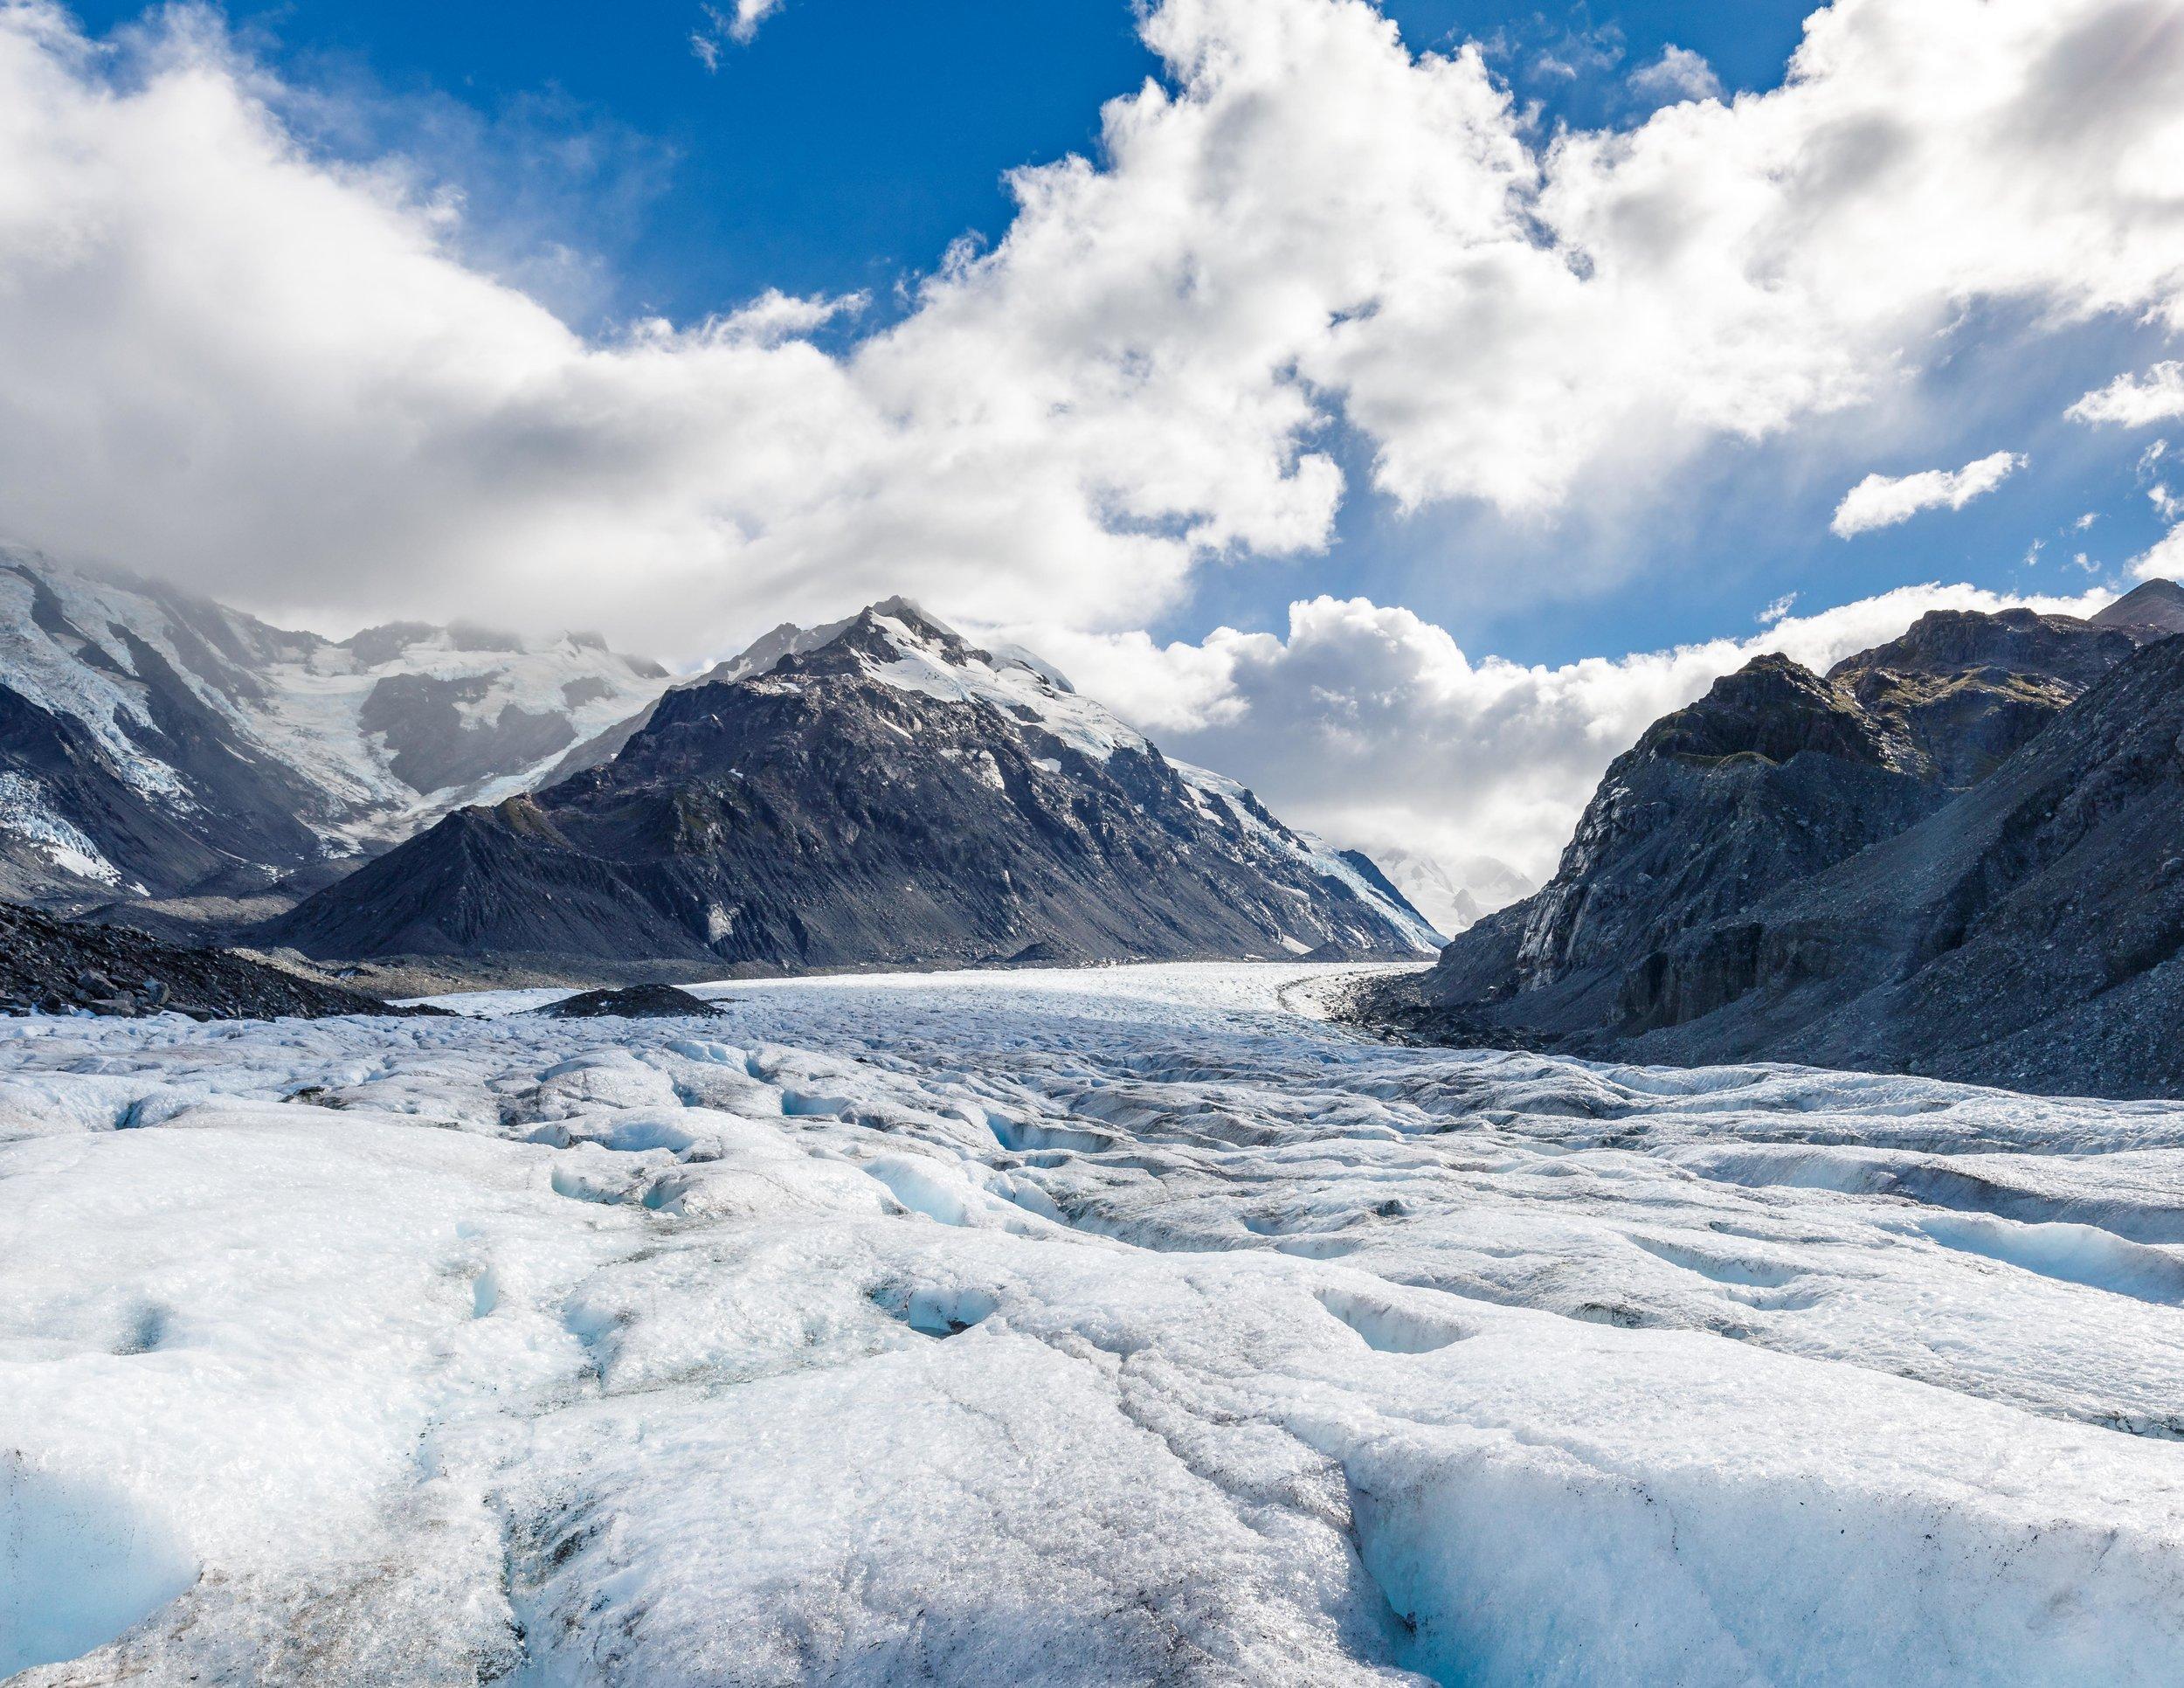 Mount Cook Heli-Hike on Tasman Glacier, New Zealand